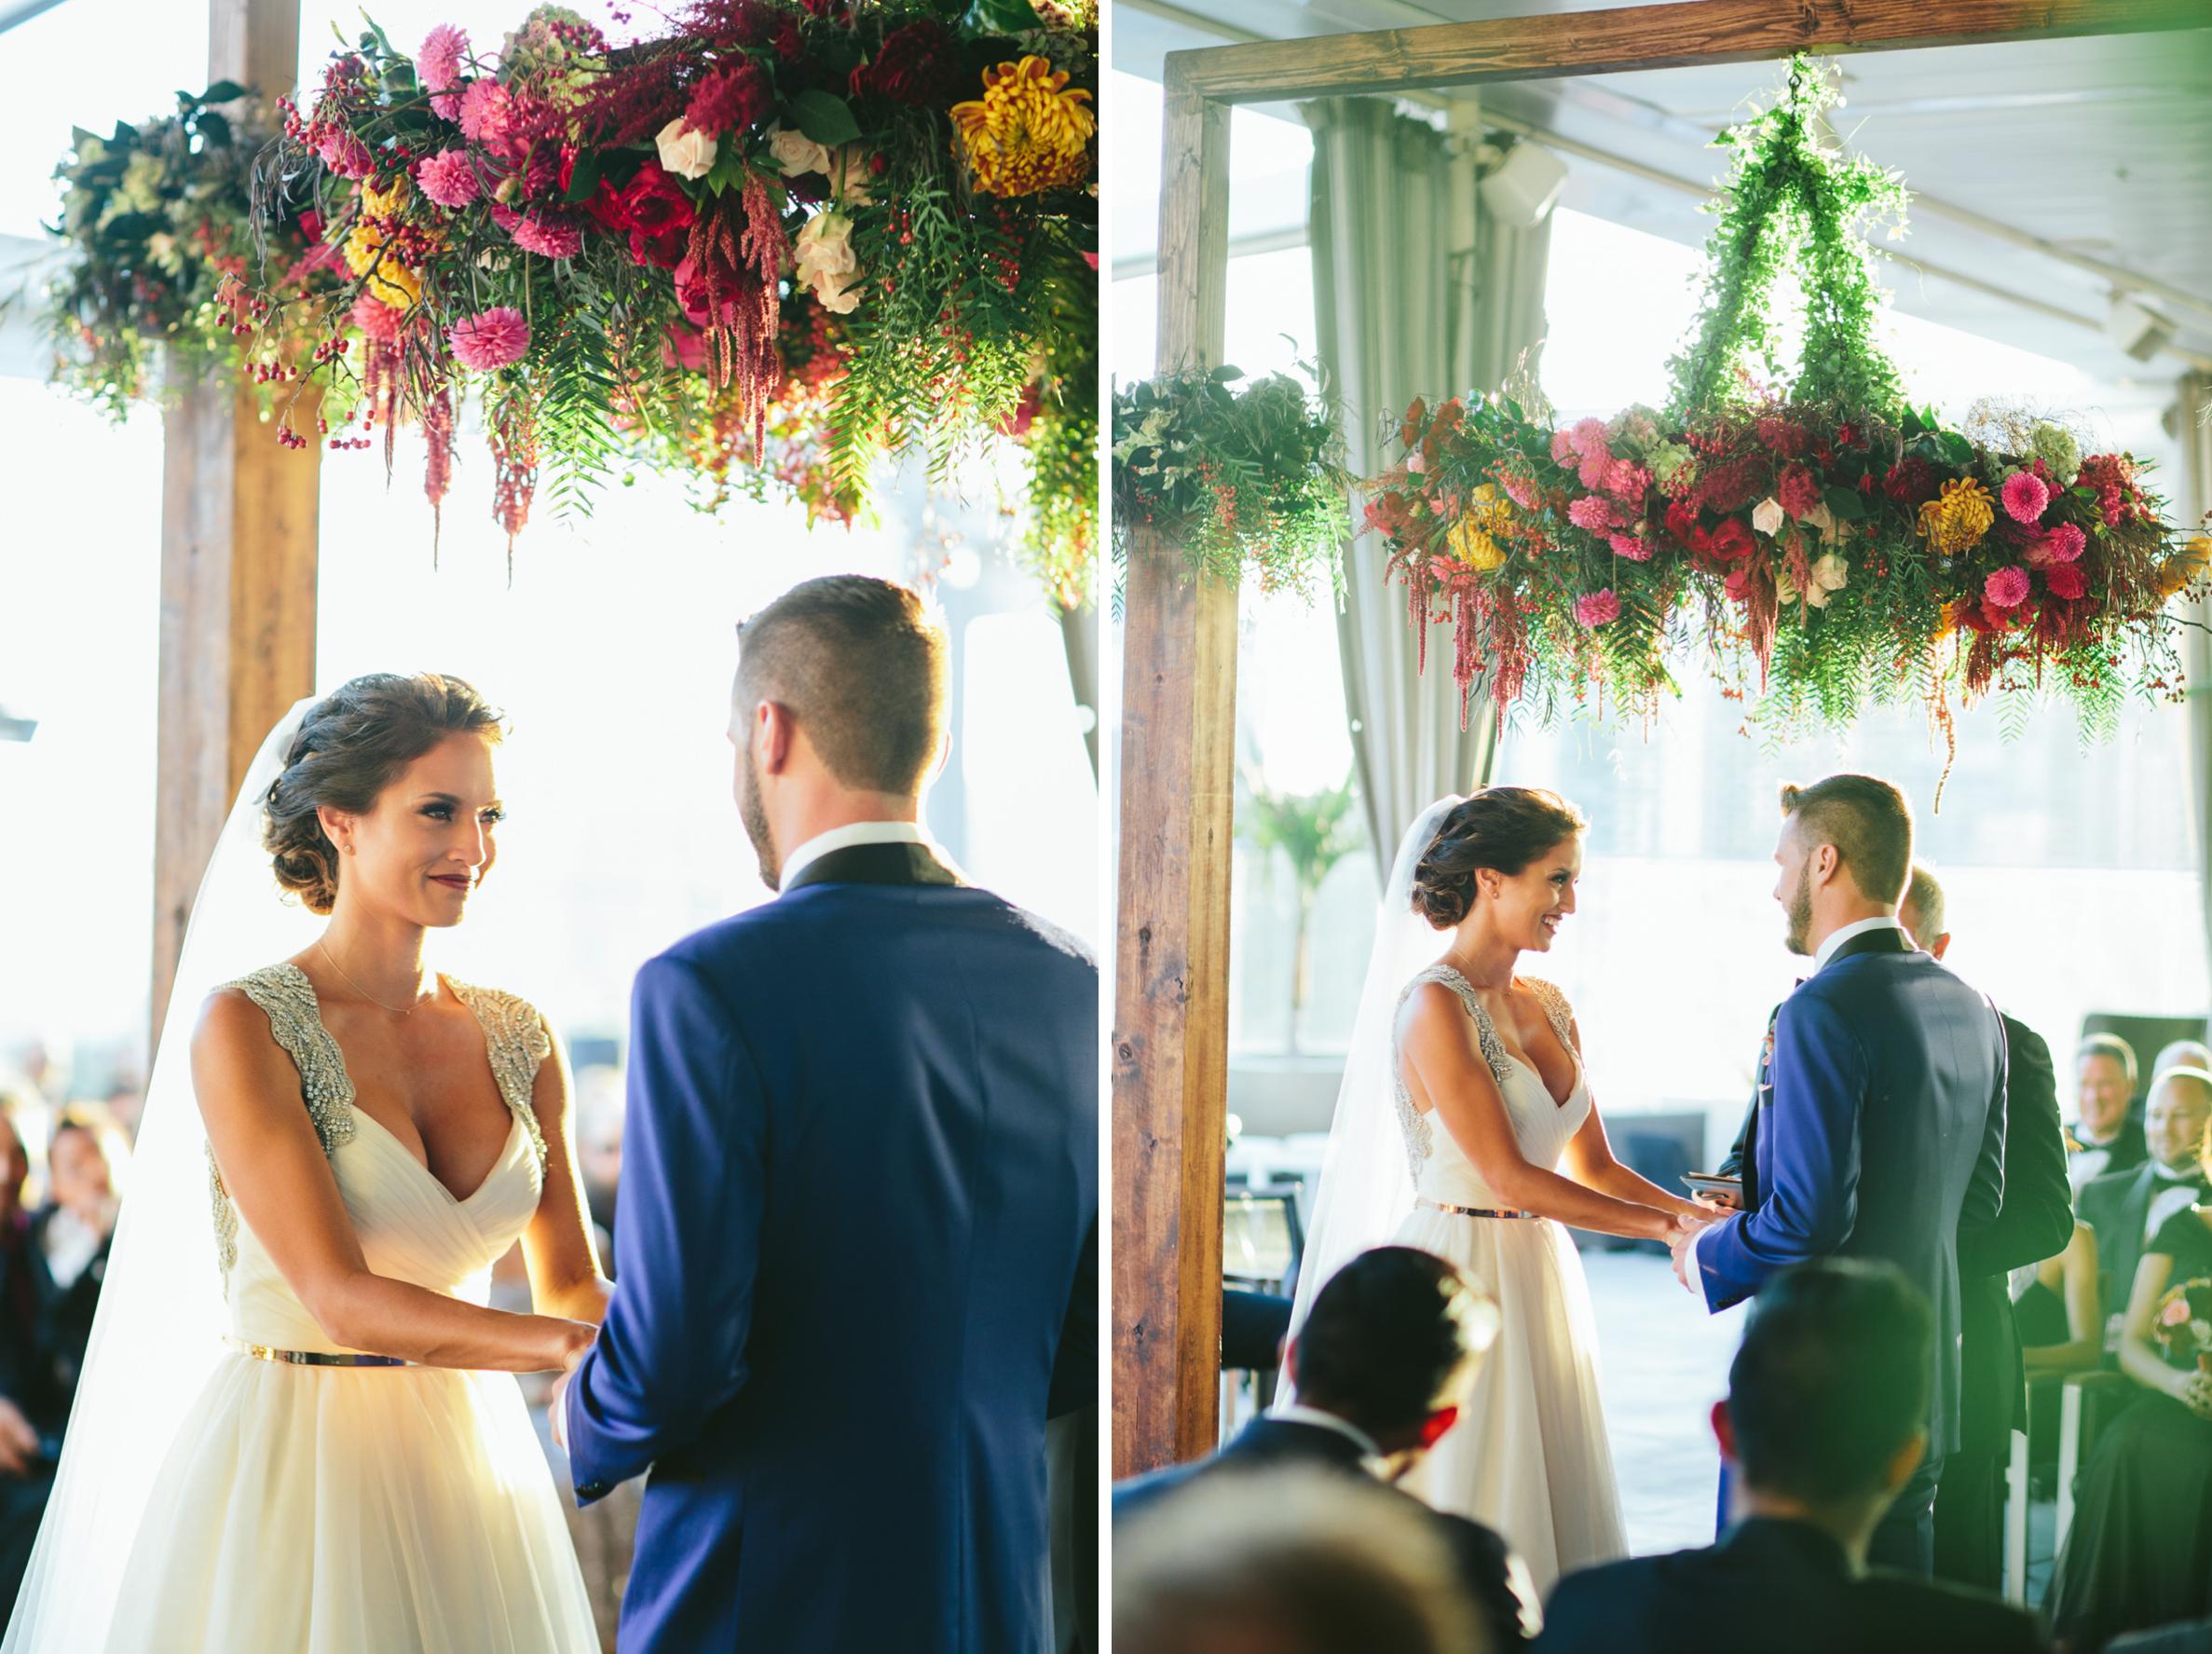 BRIANNA_JEFF_WEDDING_BLOG_LAYOUT Page 9